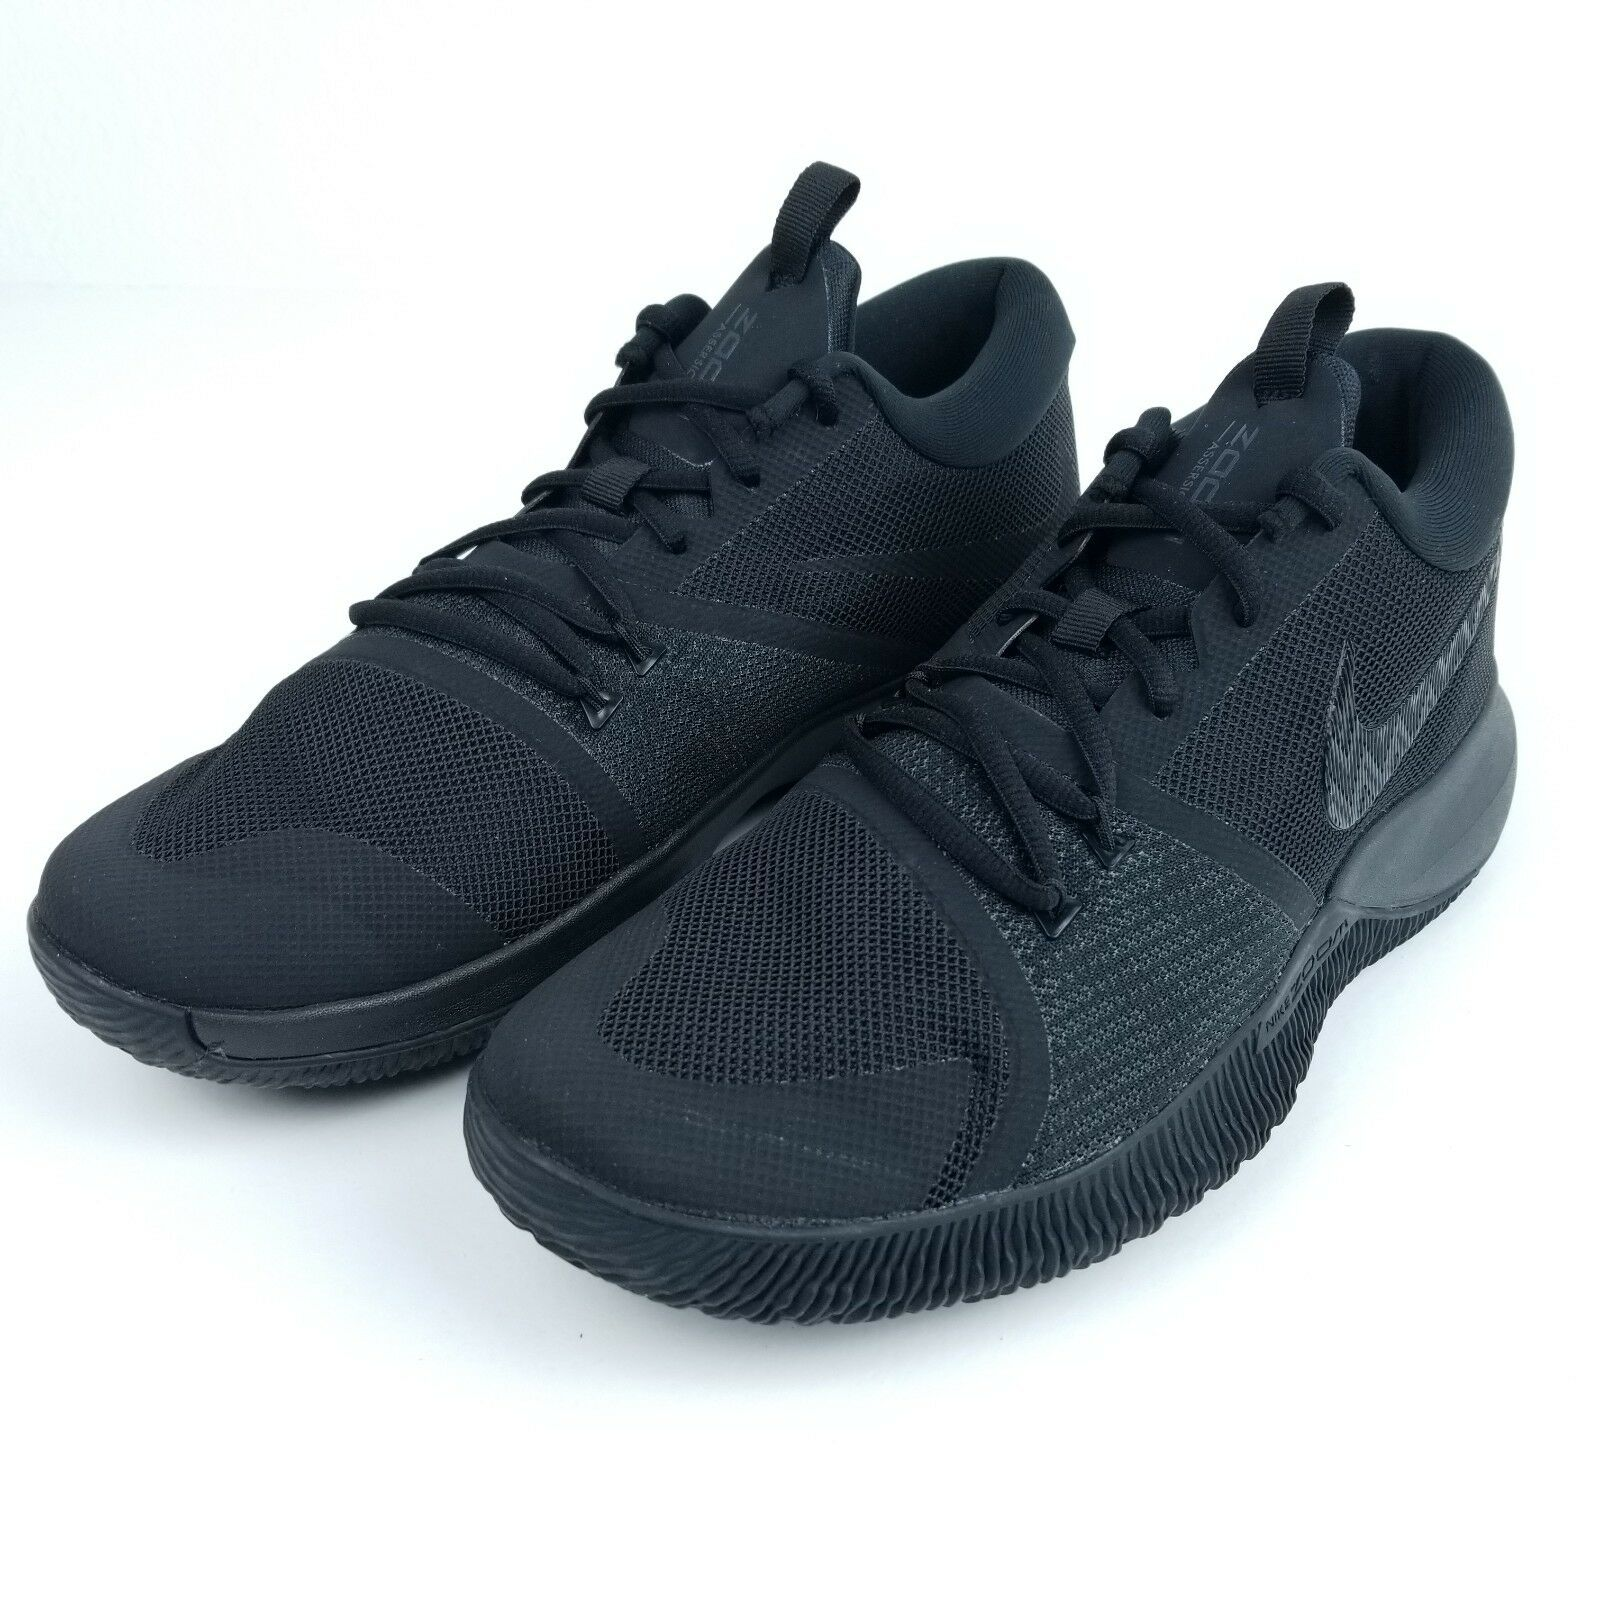 Nike Zoom Assersion Men's Basketball shoes 917505 002 Black Black Sizes